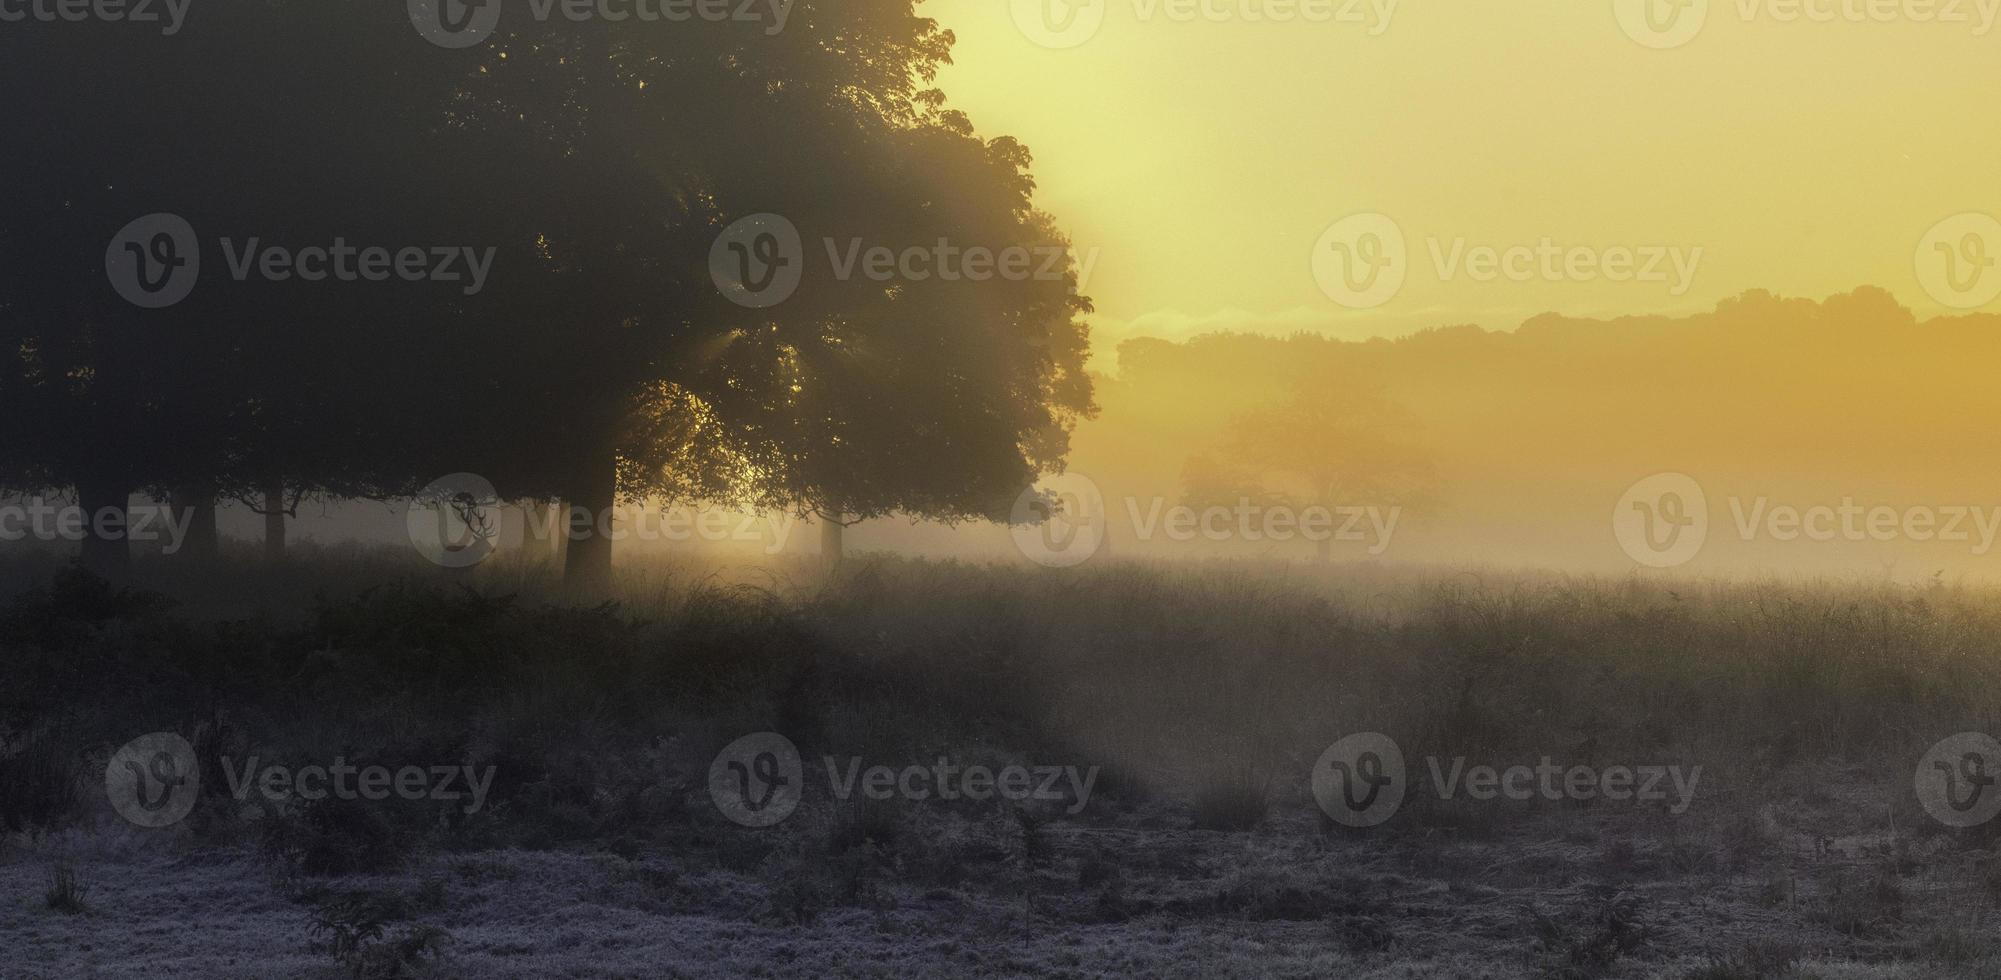 hjort natursköna foto